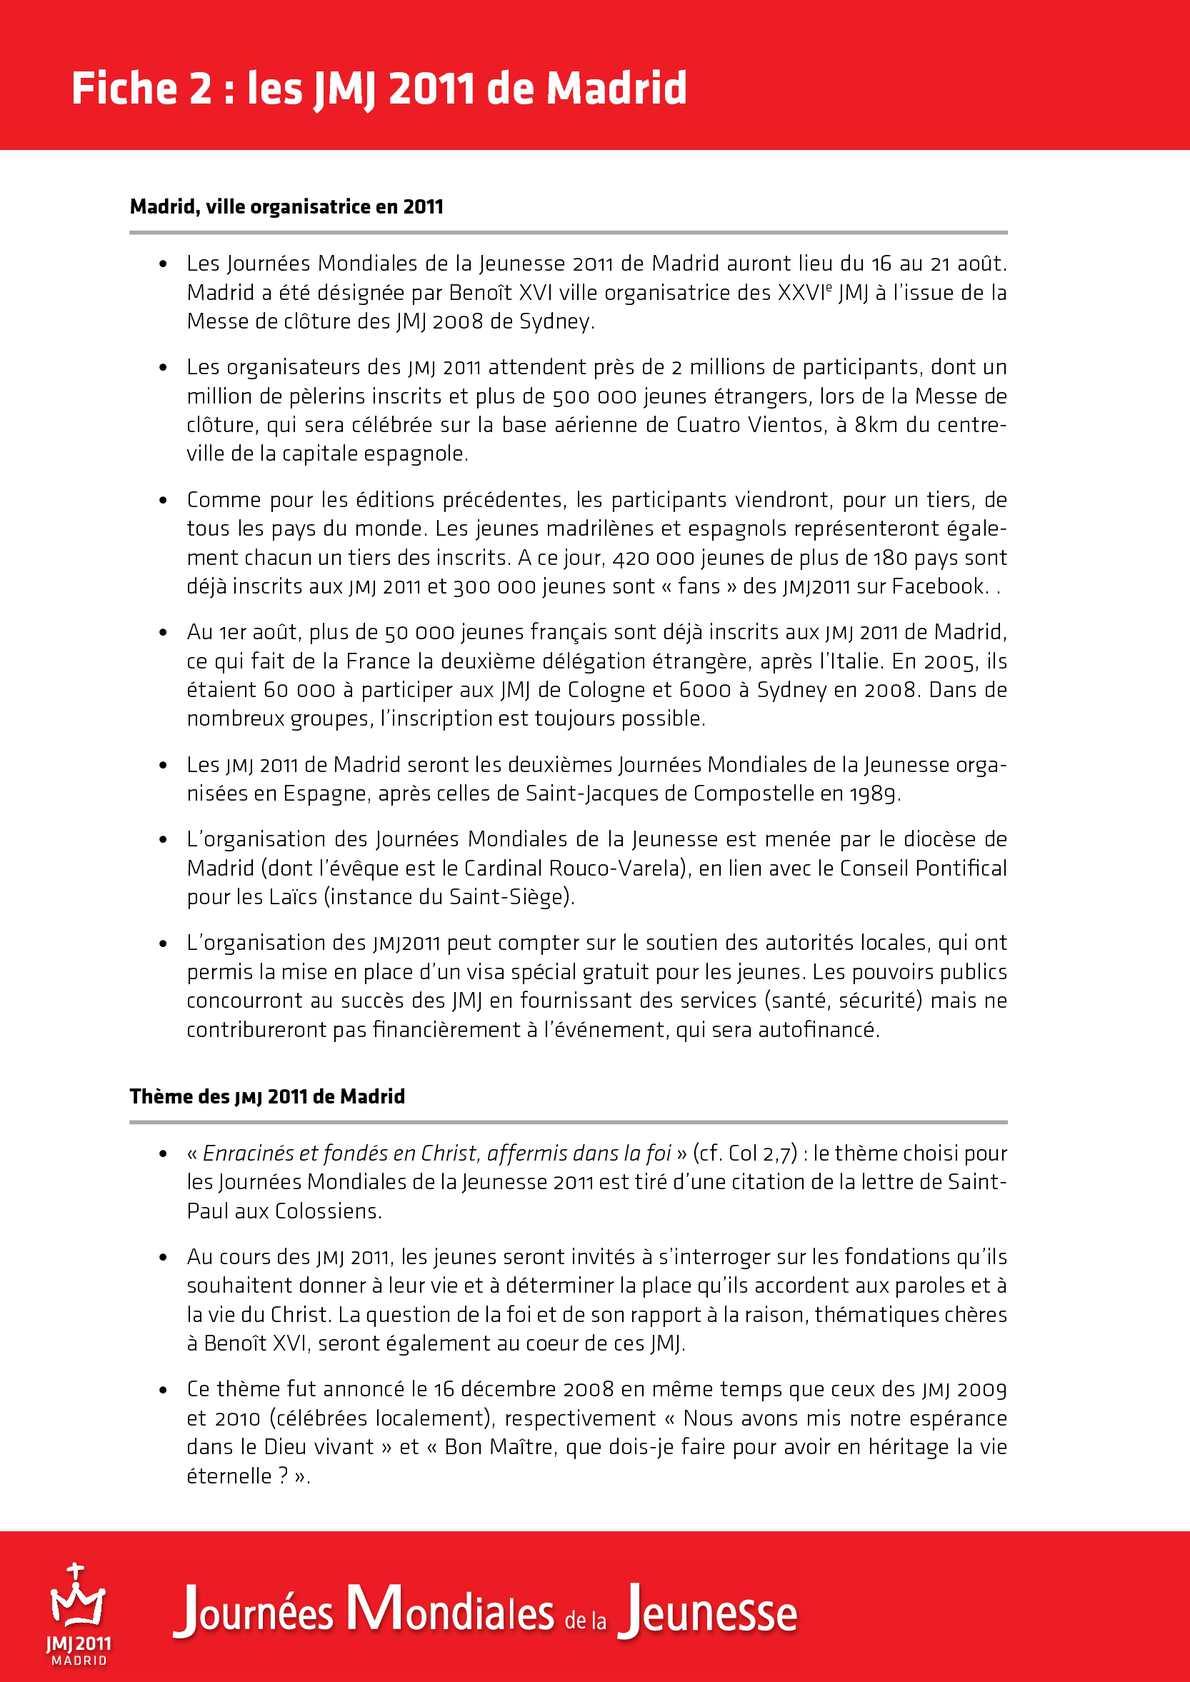 Jmj 2011 Dossier De Presse Calameo Downloader